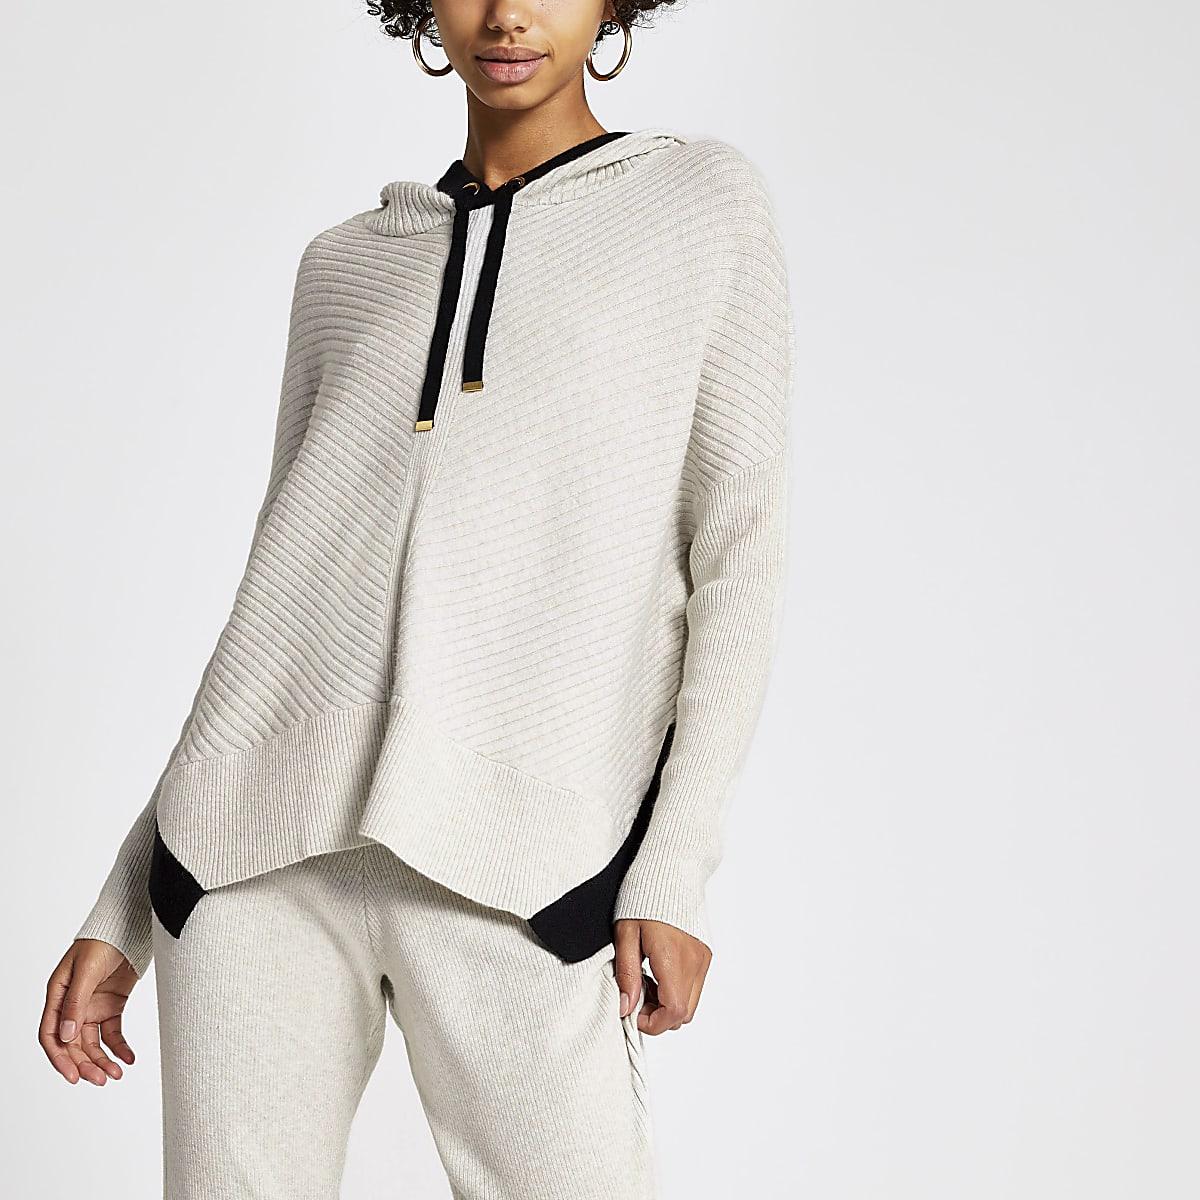 Geribbeld gebreide crèmekleurige hoodie met lange mouwen